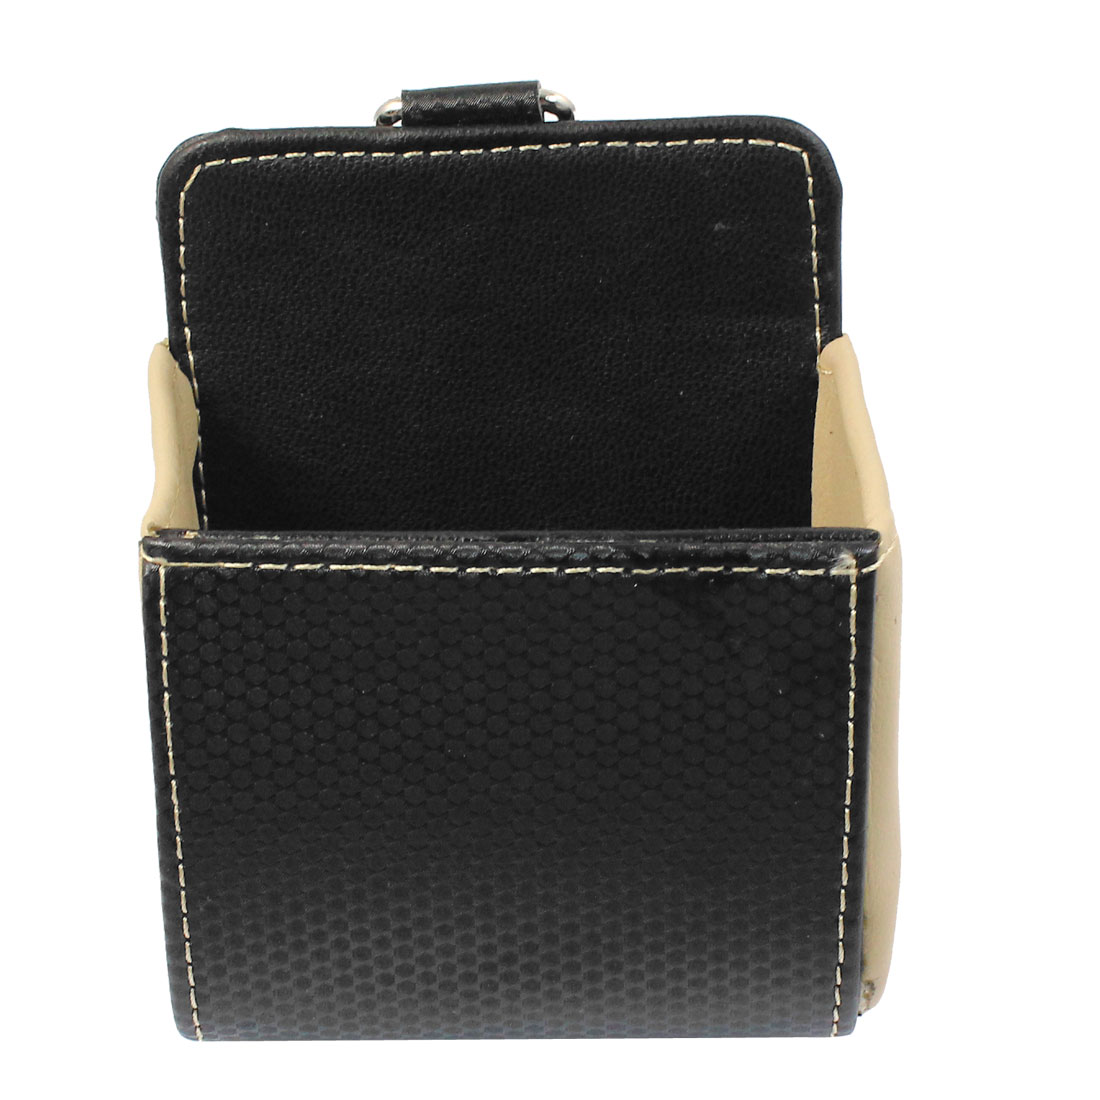 Car Black Beige Carbon Fiber Pattern Faux Leather Cell Phone Pouch Holder Case